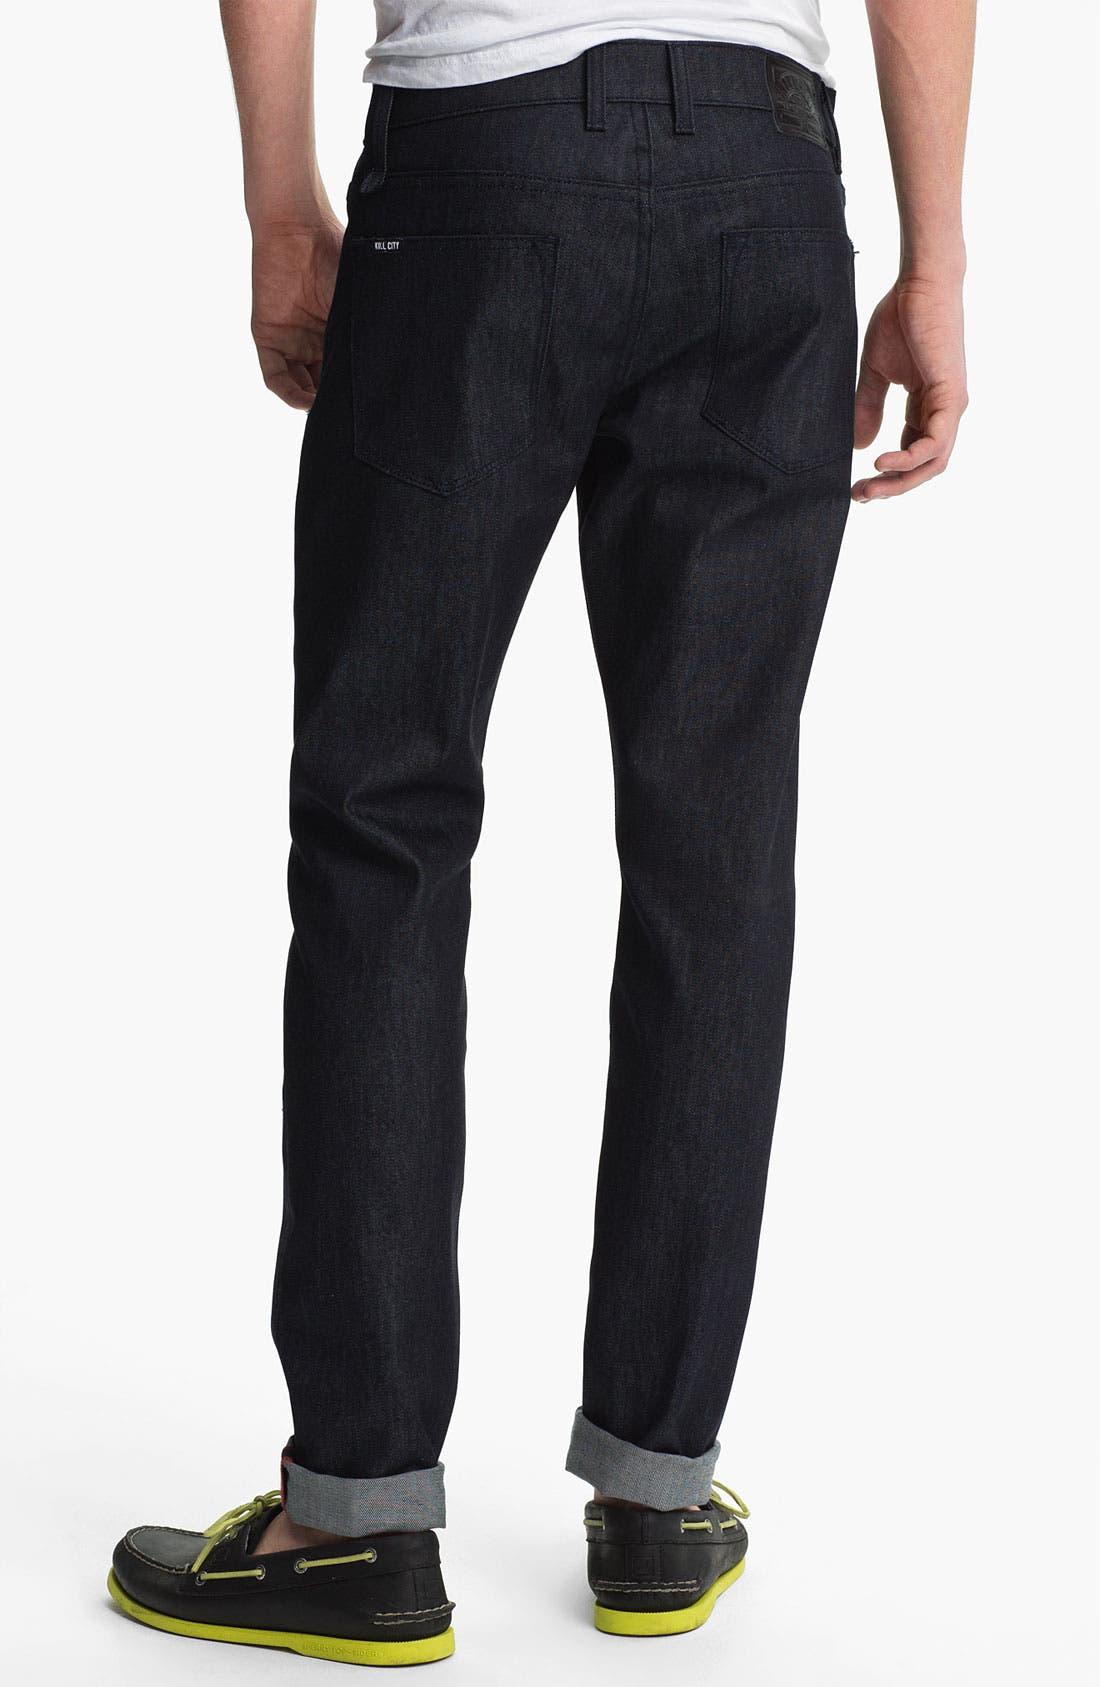 Alternate Image 1 Selected - Kill City 'Wire' Slim Skinny Leg Jeans (Indigo)